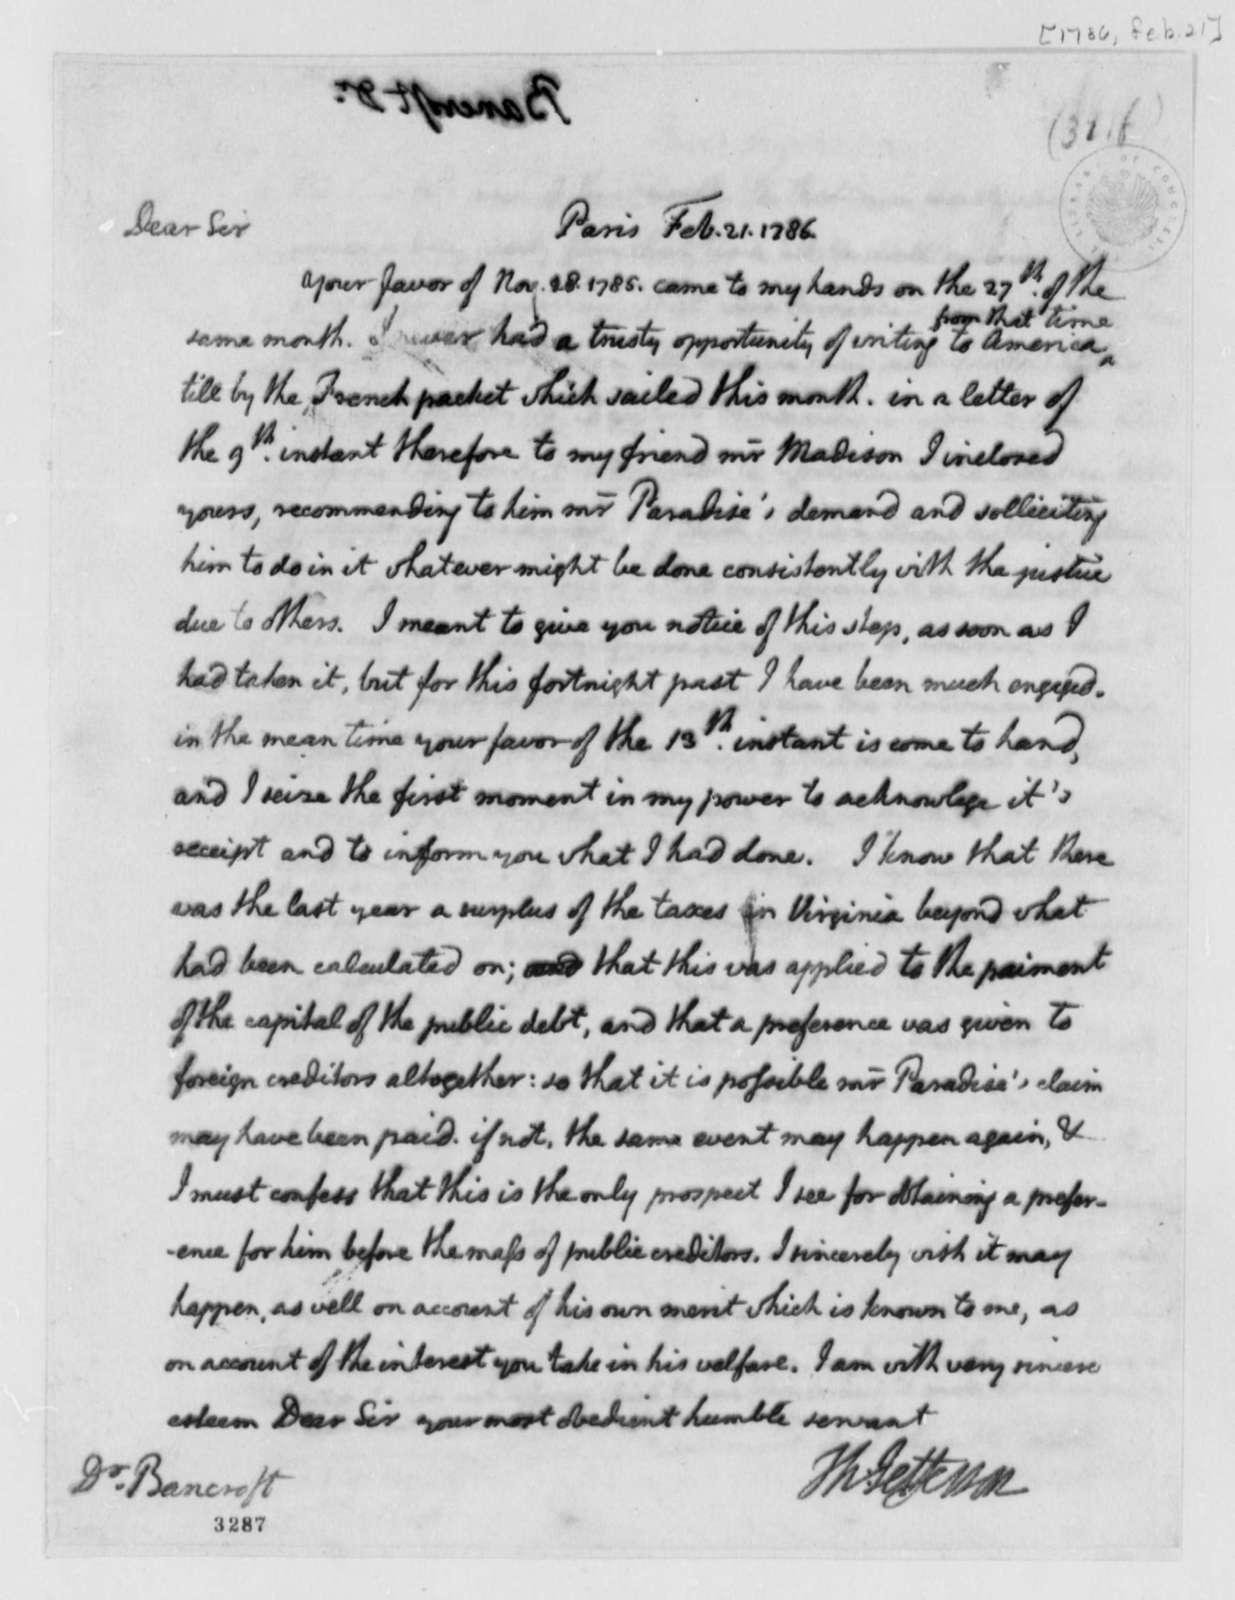 Thomas Jefferson to Edward Bancroft, February 21, 1786